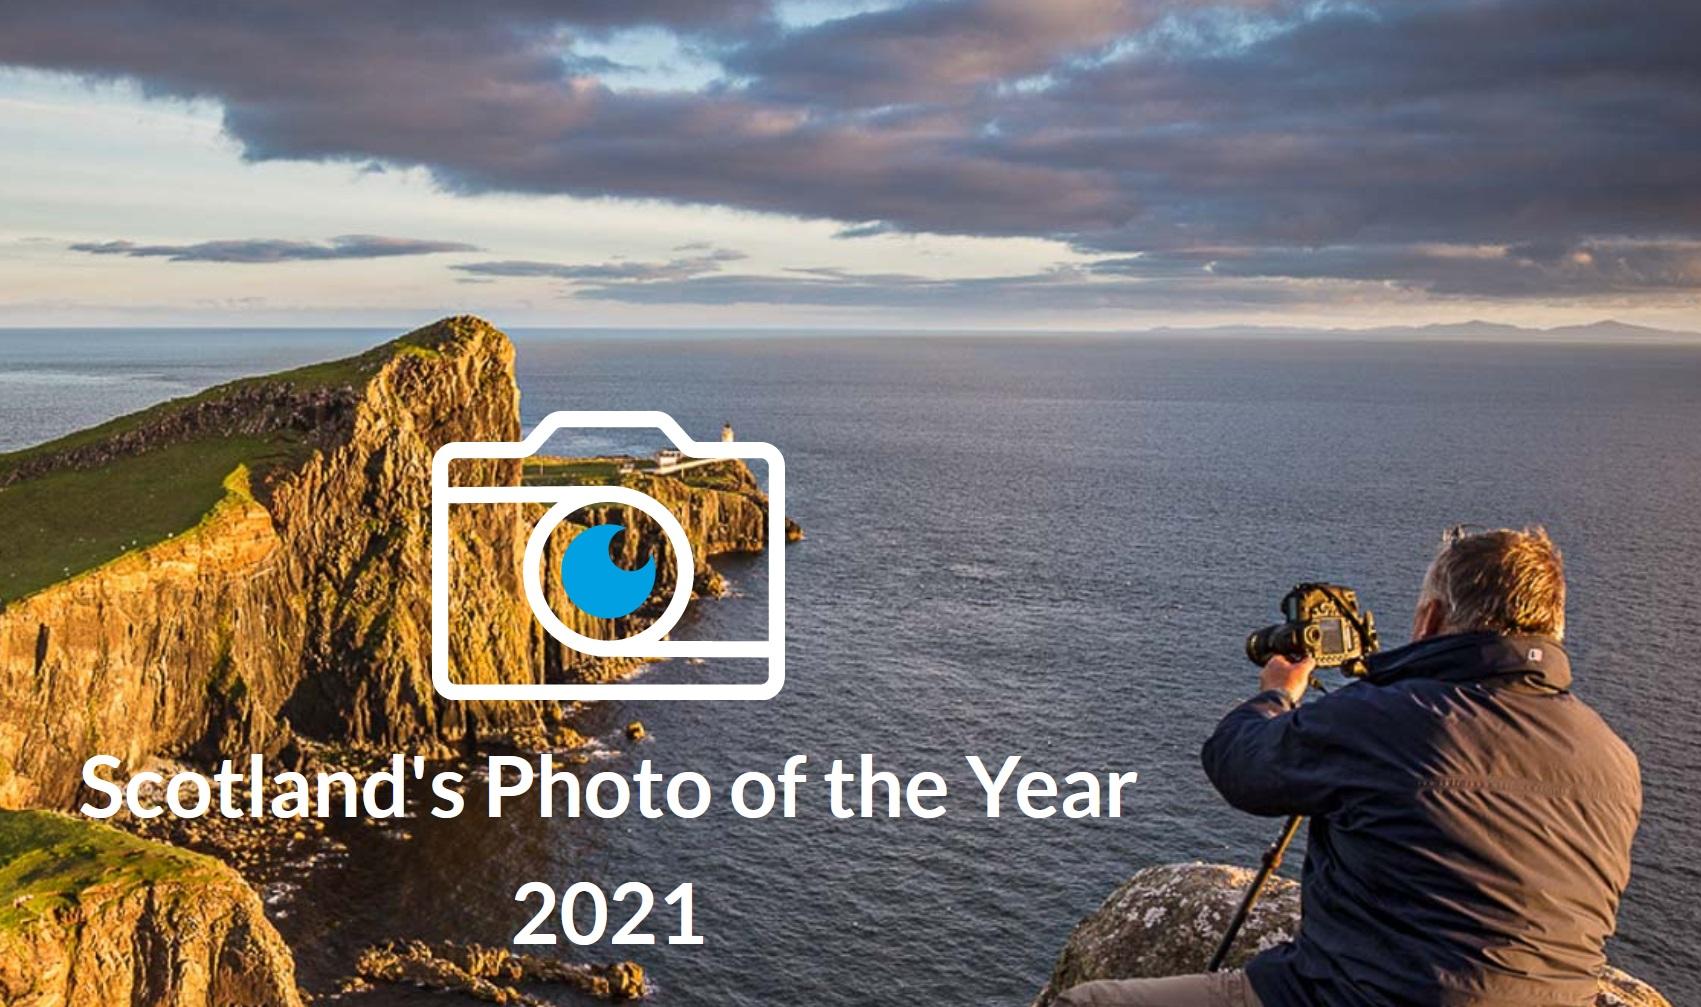 Scotland's Photo of the Year 2021 - logo